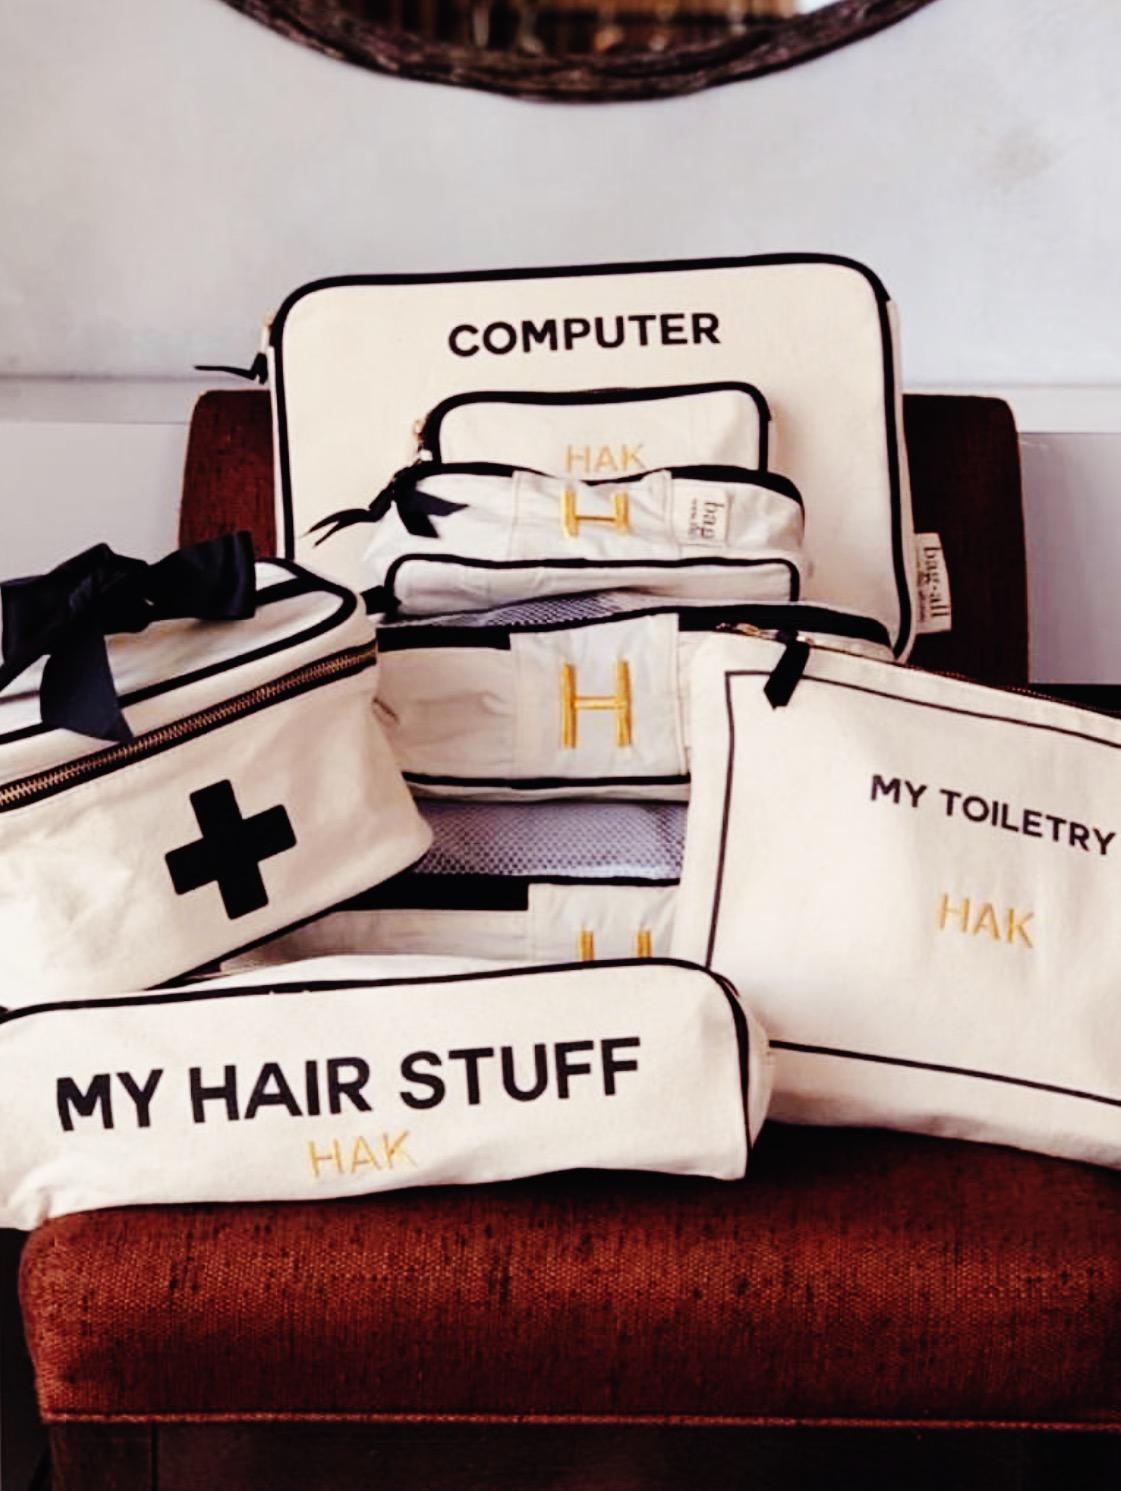 computer case, packing cubes, medical box, hair stuff, my toiletry case, monogram, mood bag-all.jpg